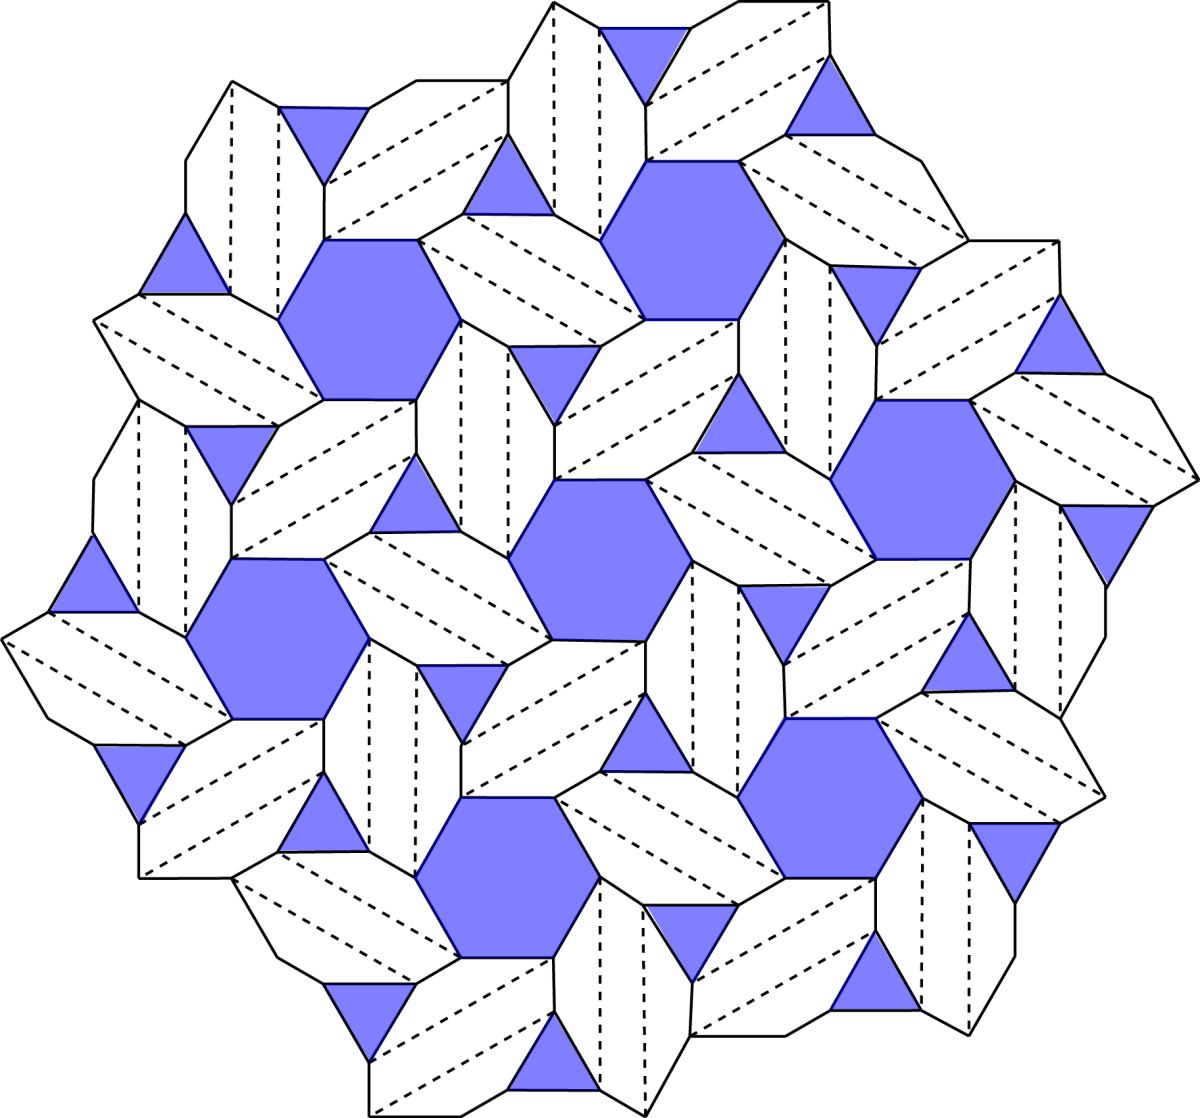 Joel Cooper's Basket Weave, Crease pattern